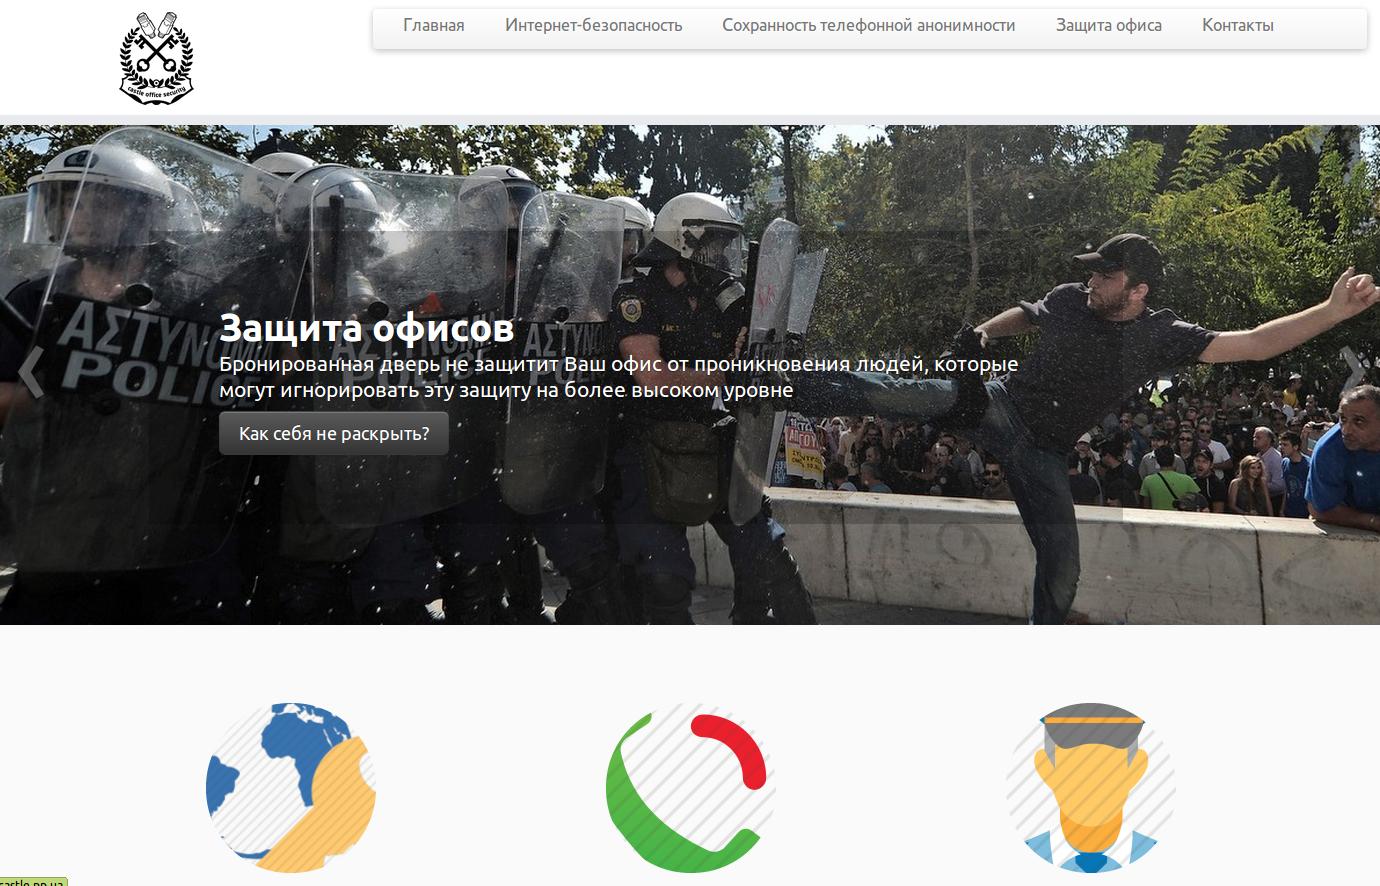 Сайт компании по IT-защите офисов